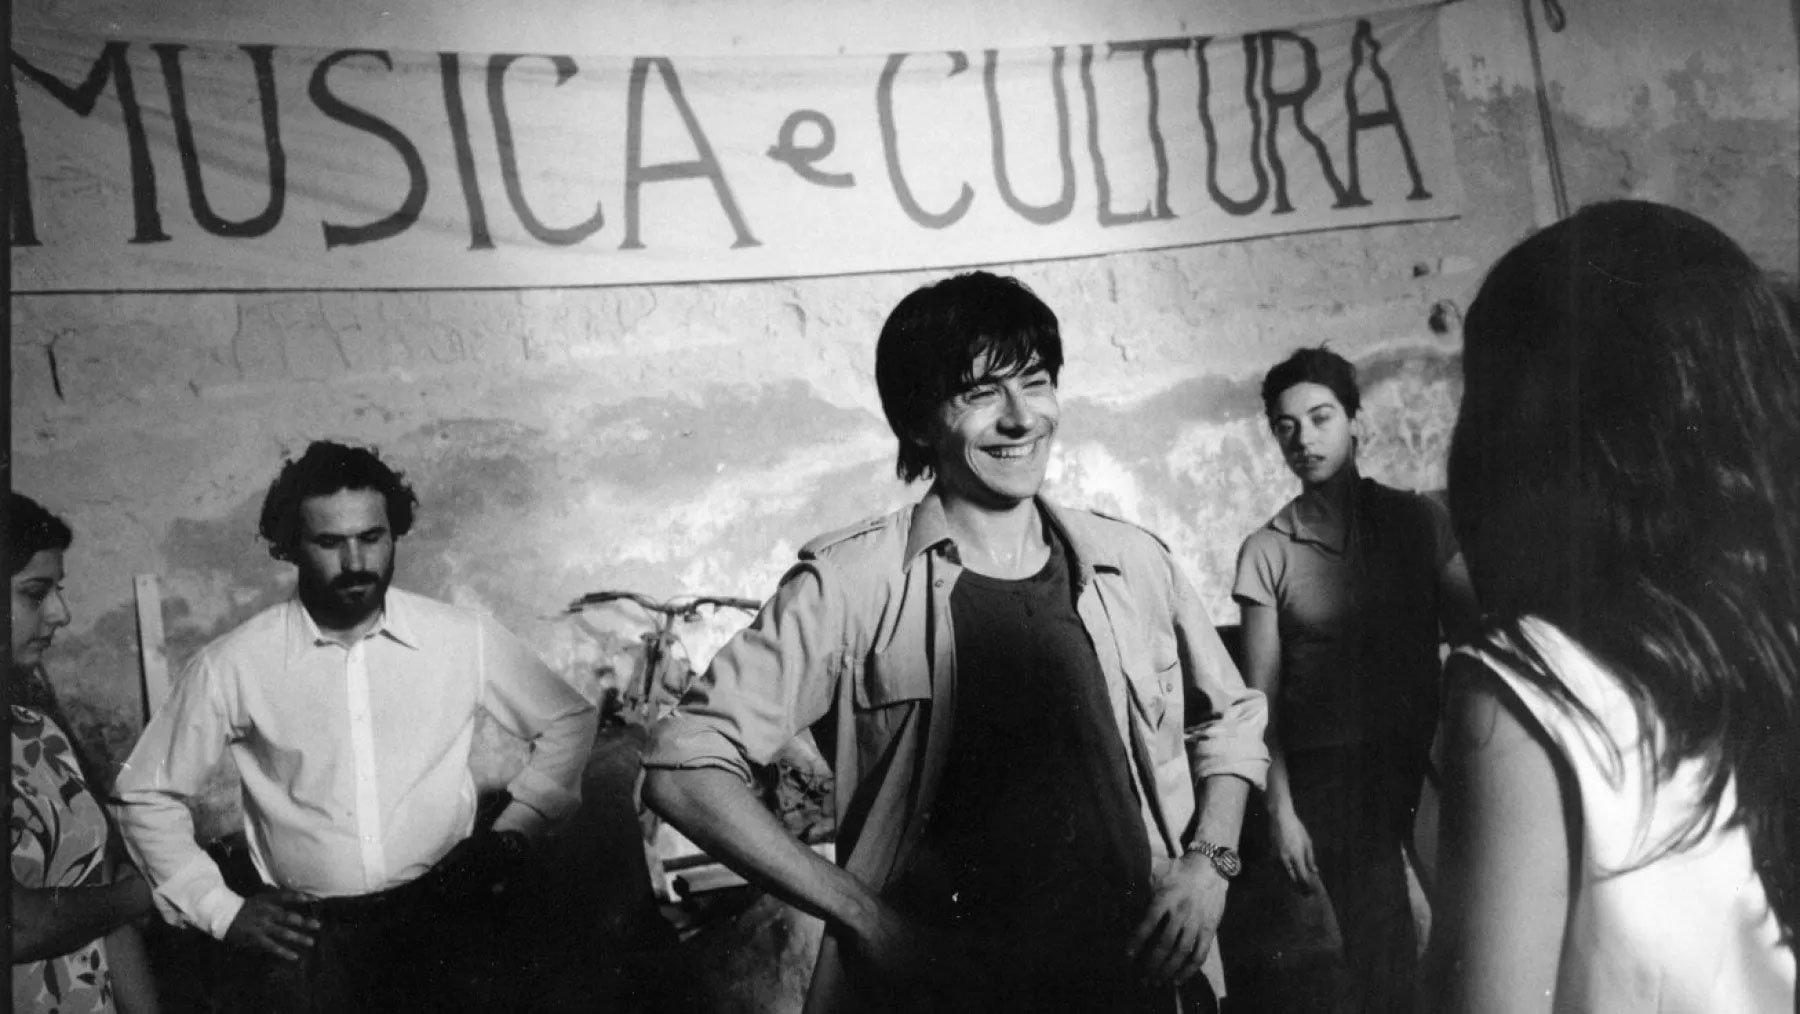 I cento passi: la scena inedita svelata da Marco Tullio Giordana